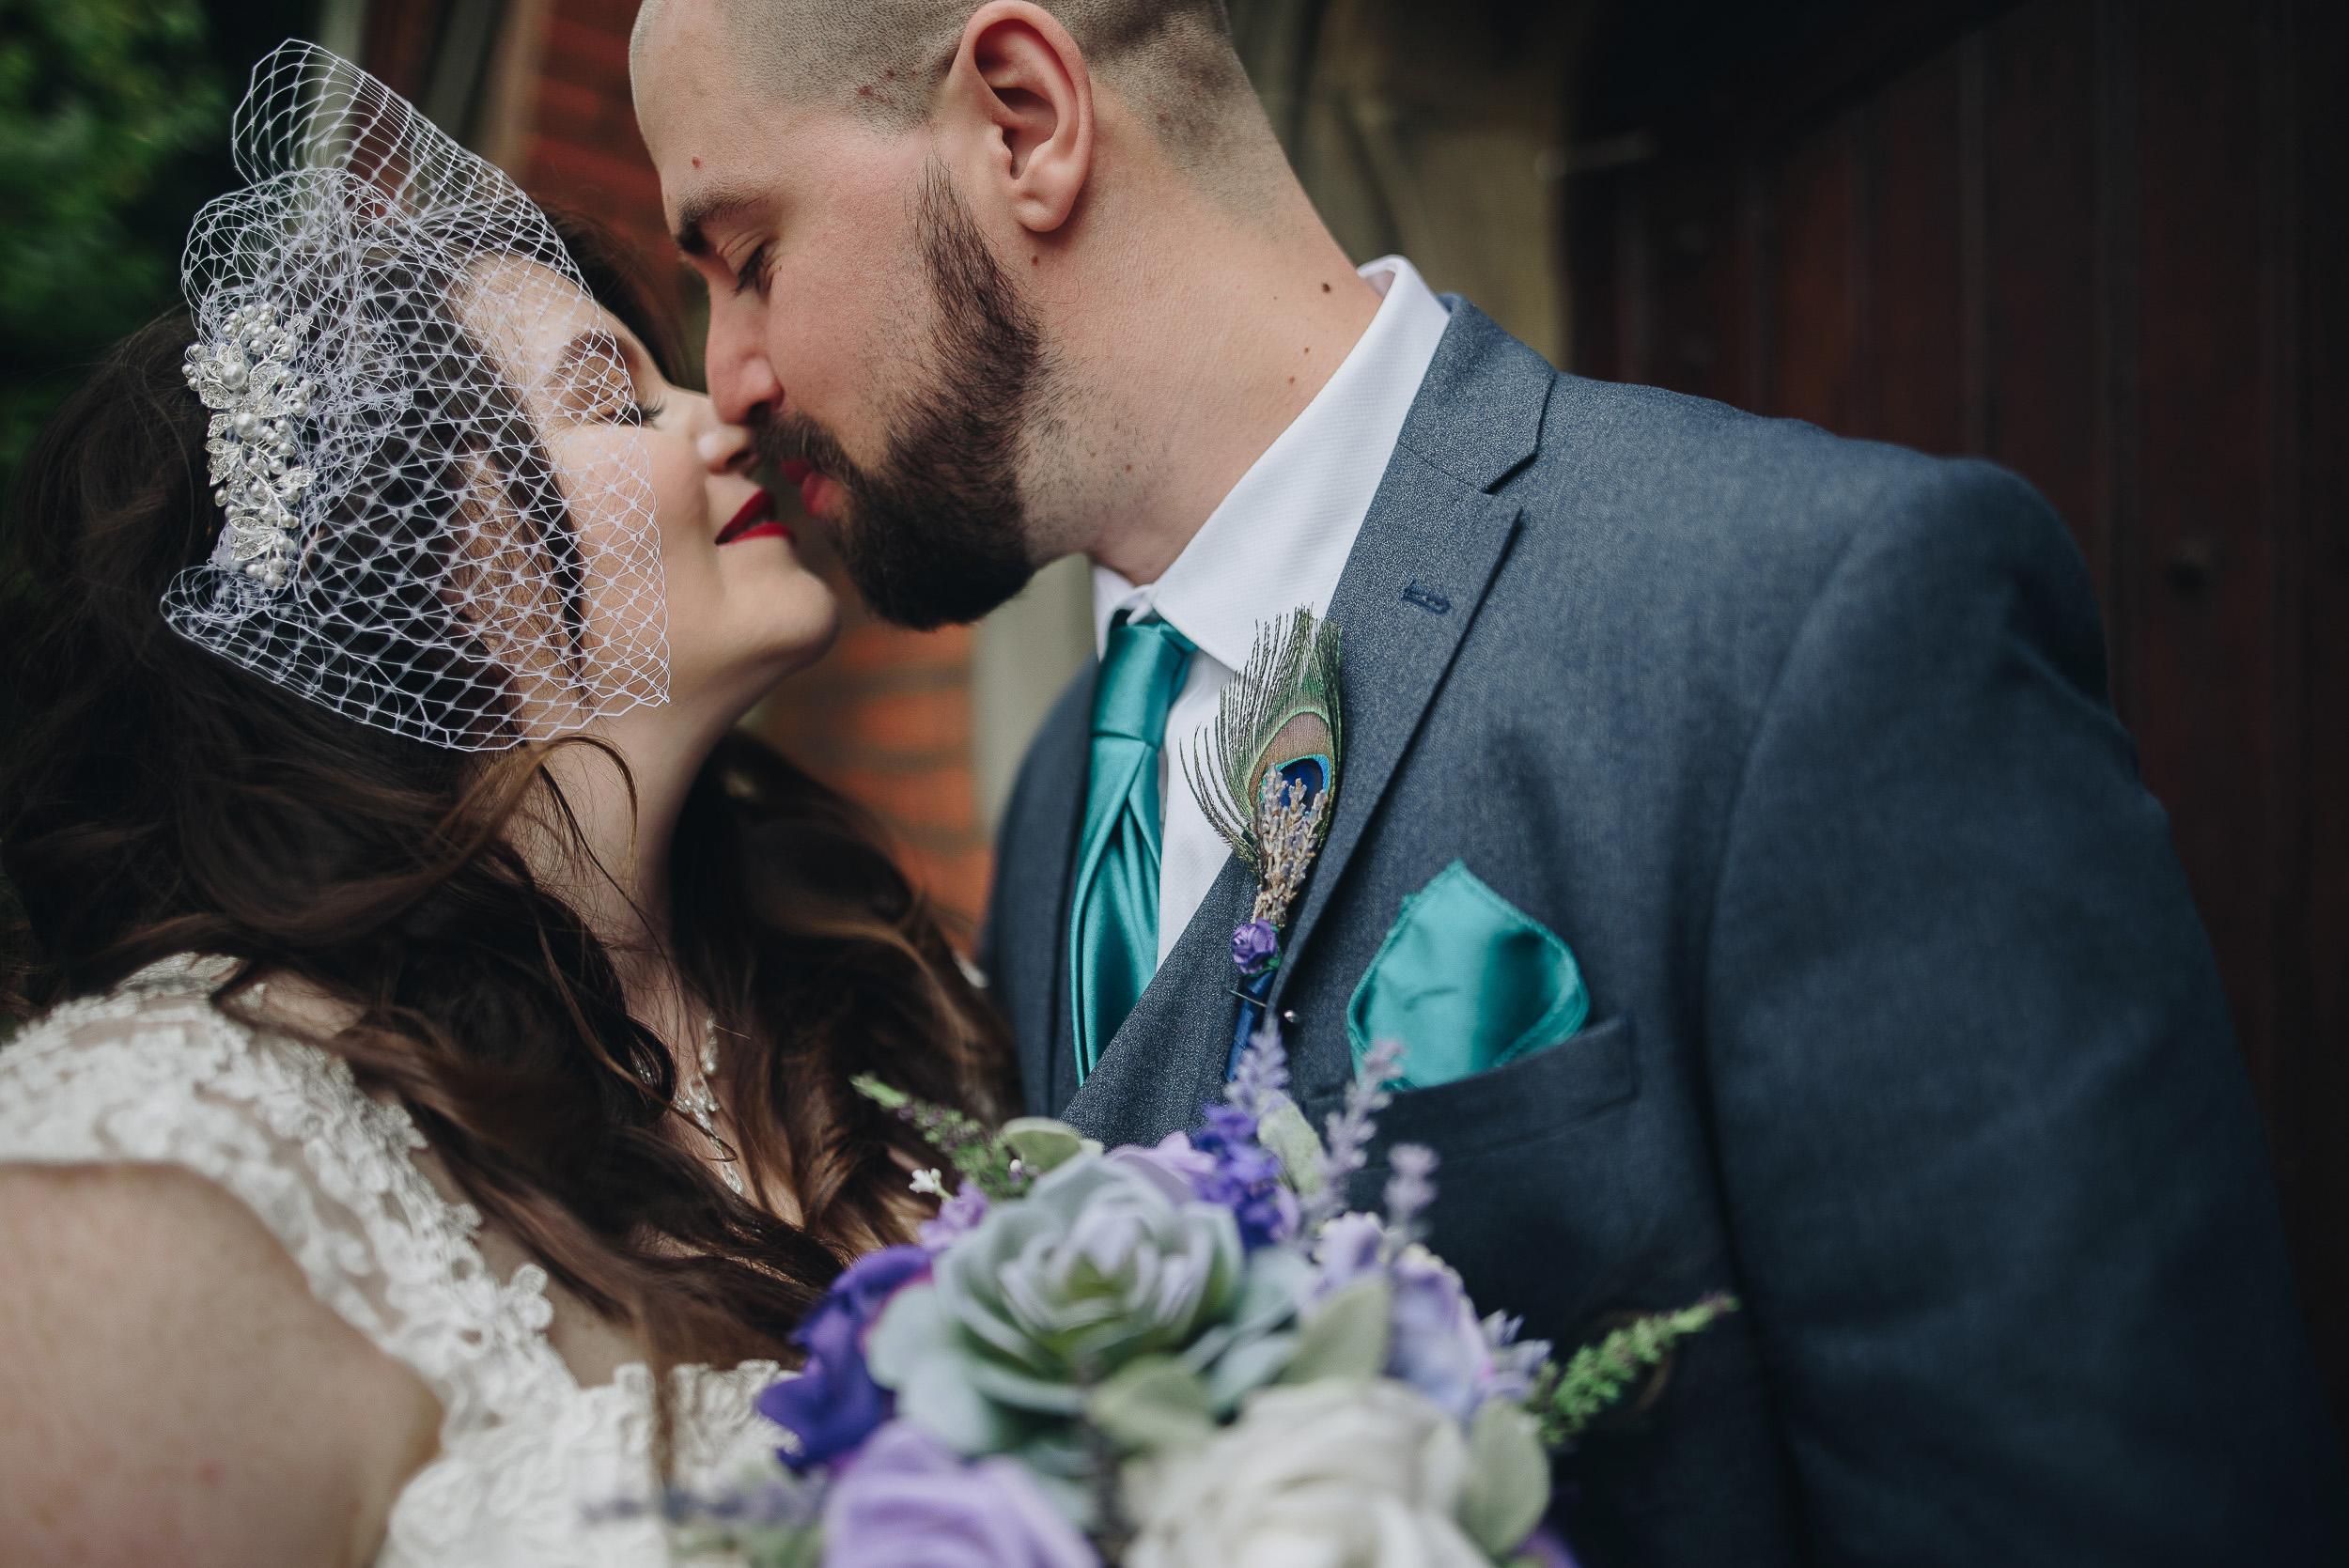 Smithills-hall-wedding-manchester-the-barlow-edgworth-hadfield-64.jpg